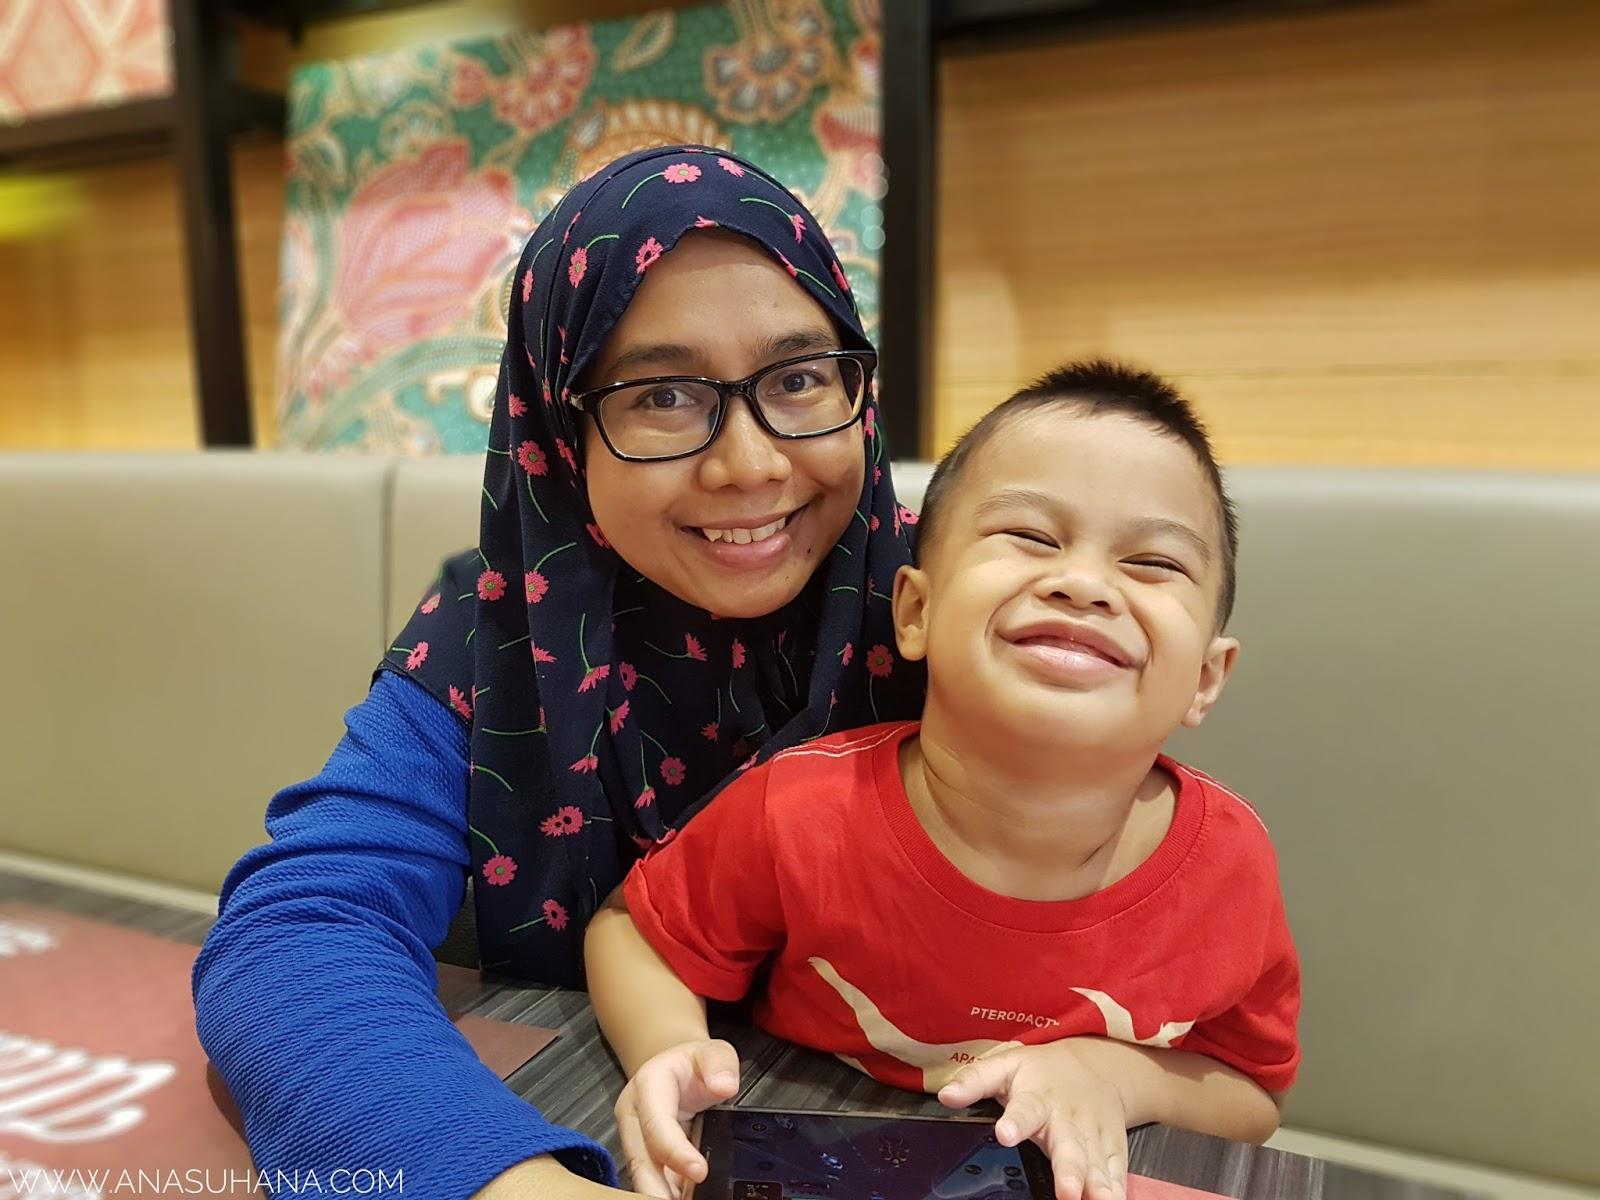 Sepiring Sunway Putra Mall